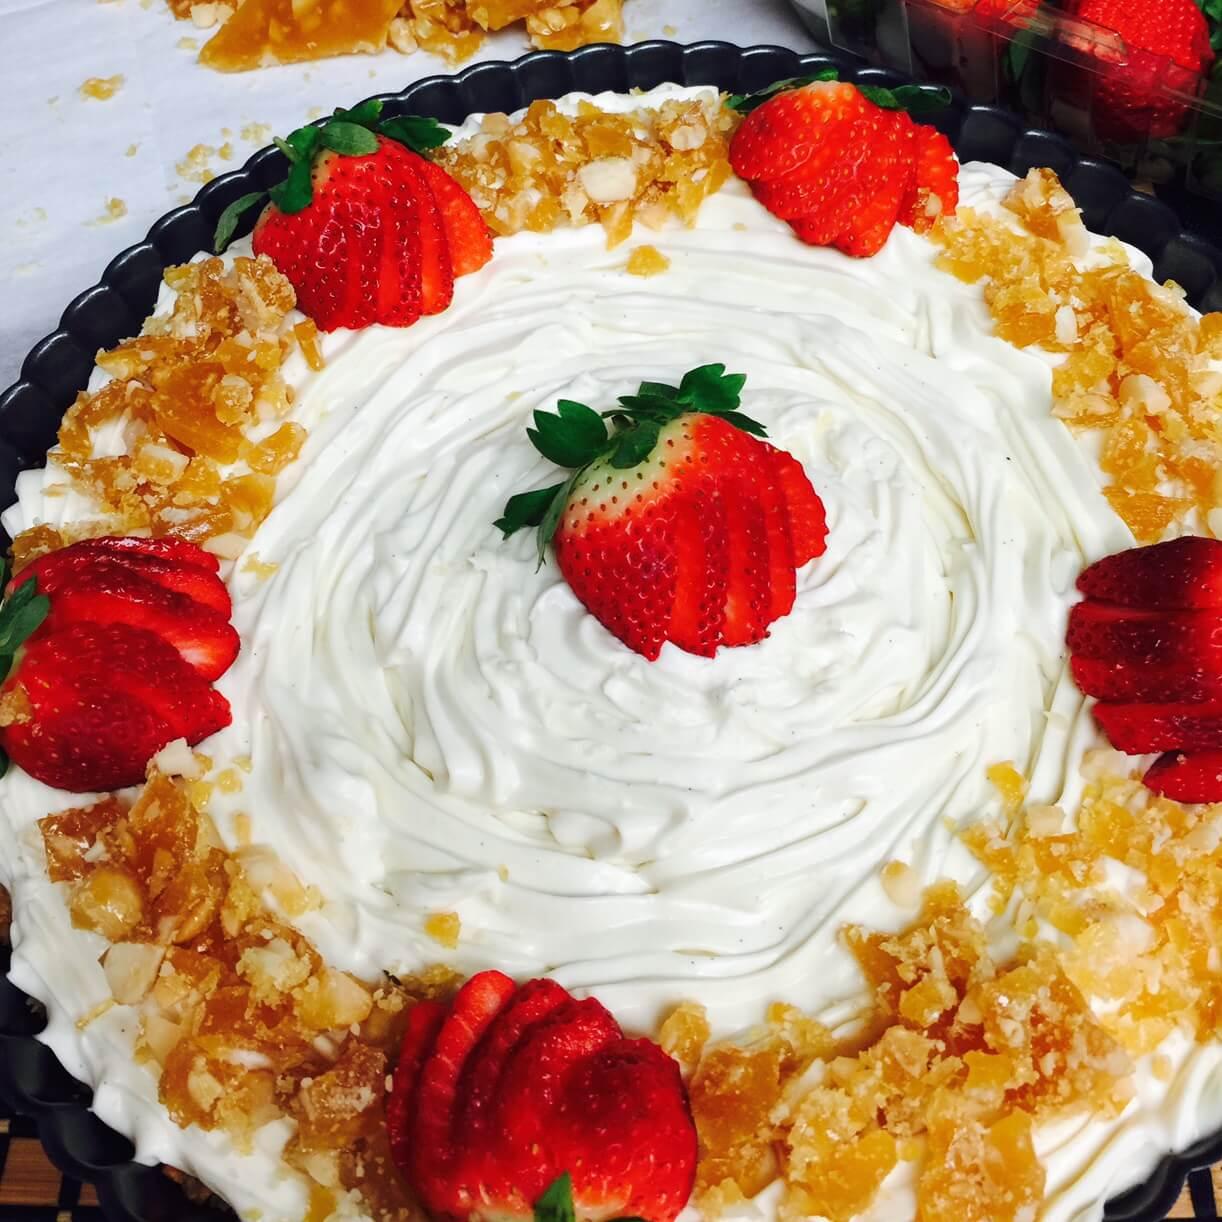 White Chocolate Caramel Cheesecake With Macadamia Nuts Recipe